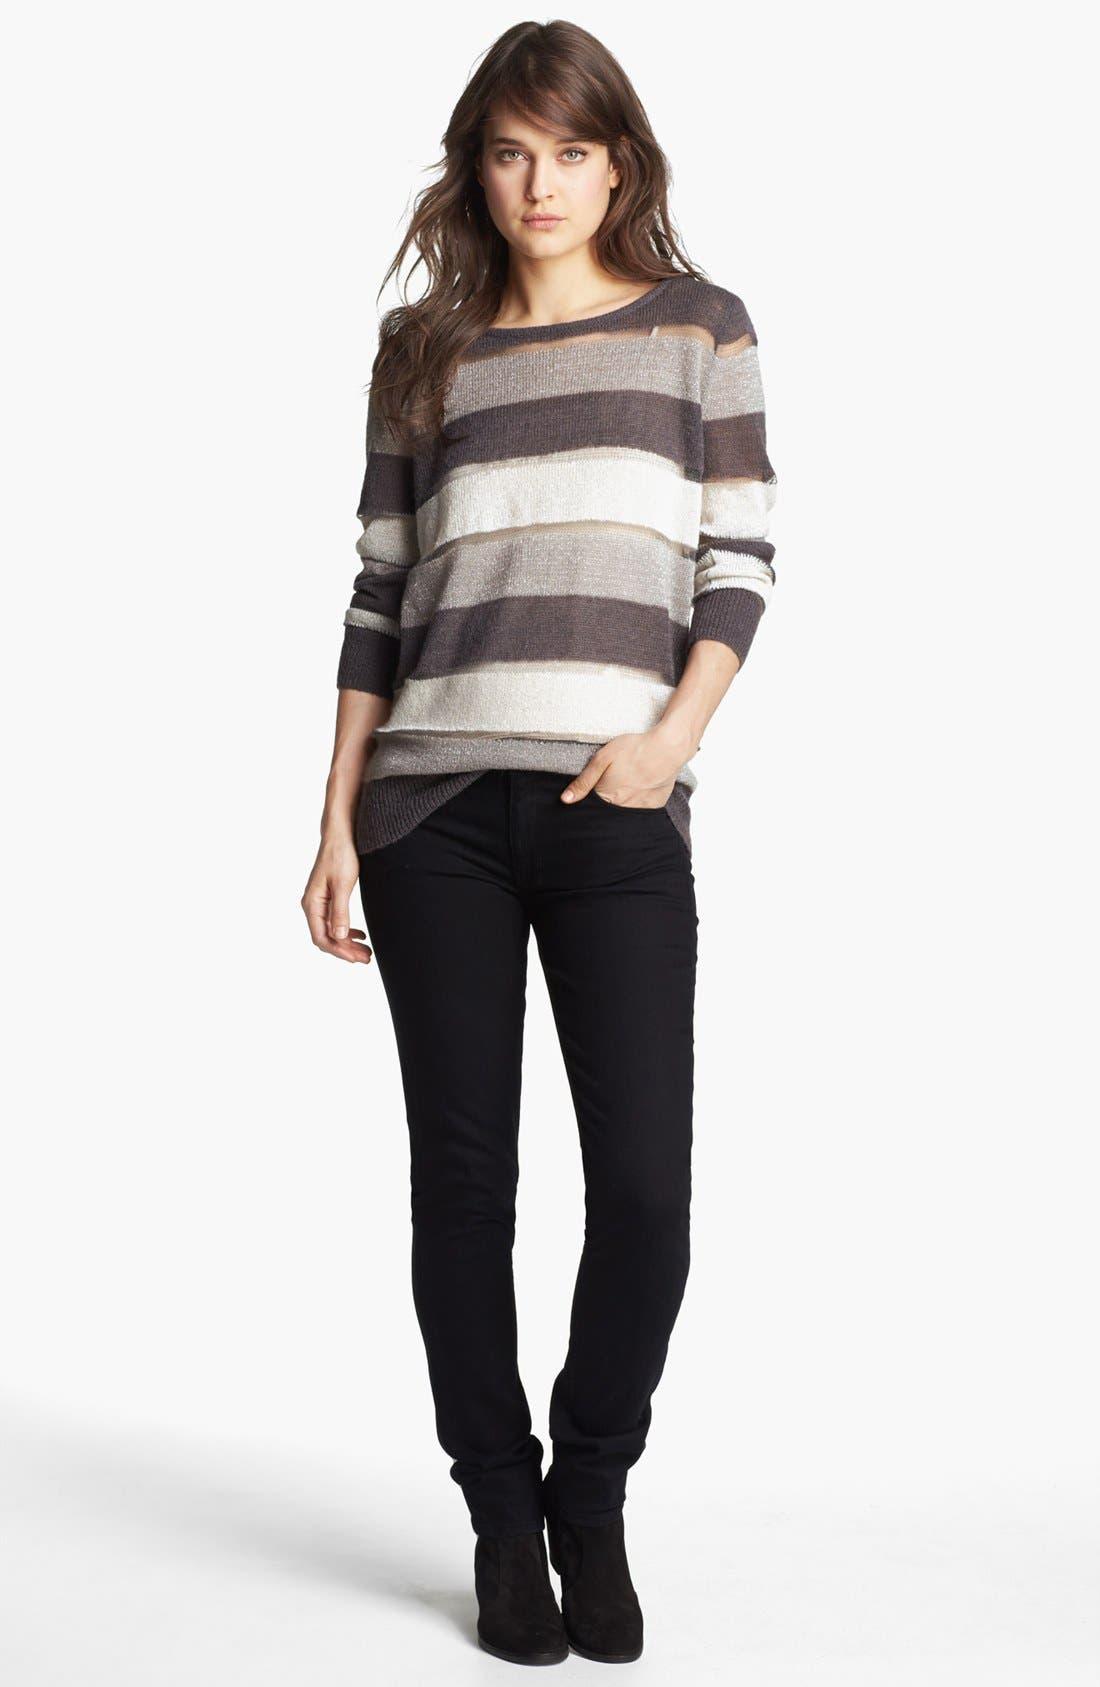 Alternate Image 1 Selected - Hinge Sweater & Hudson Jeans Skinny Jeans